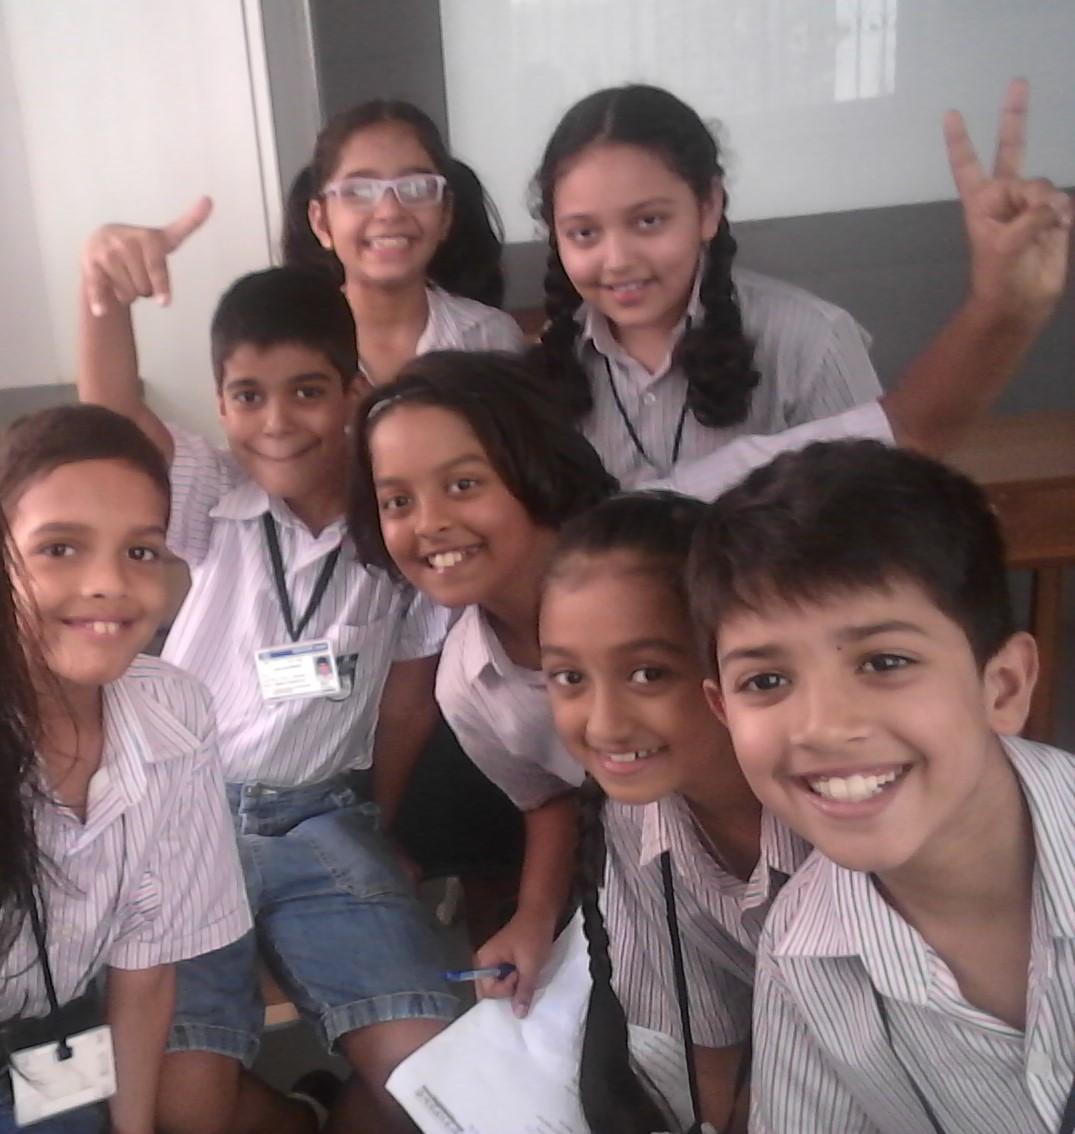 Beacon high school students